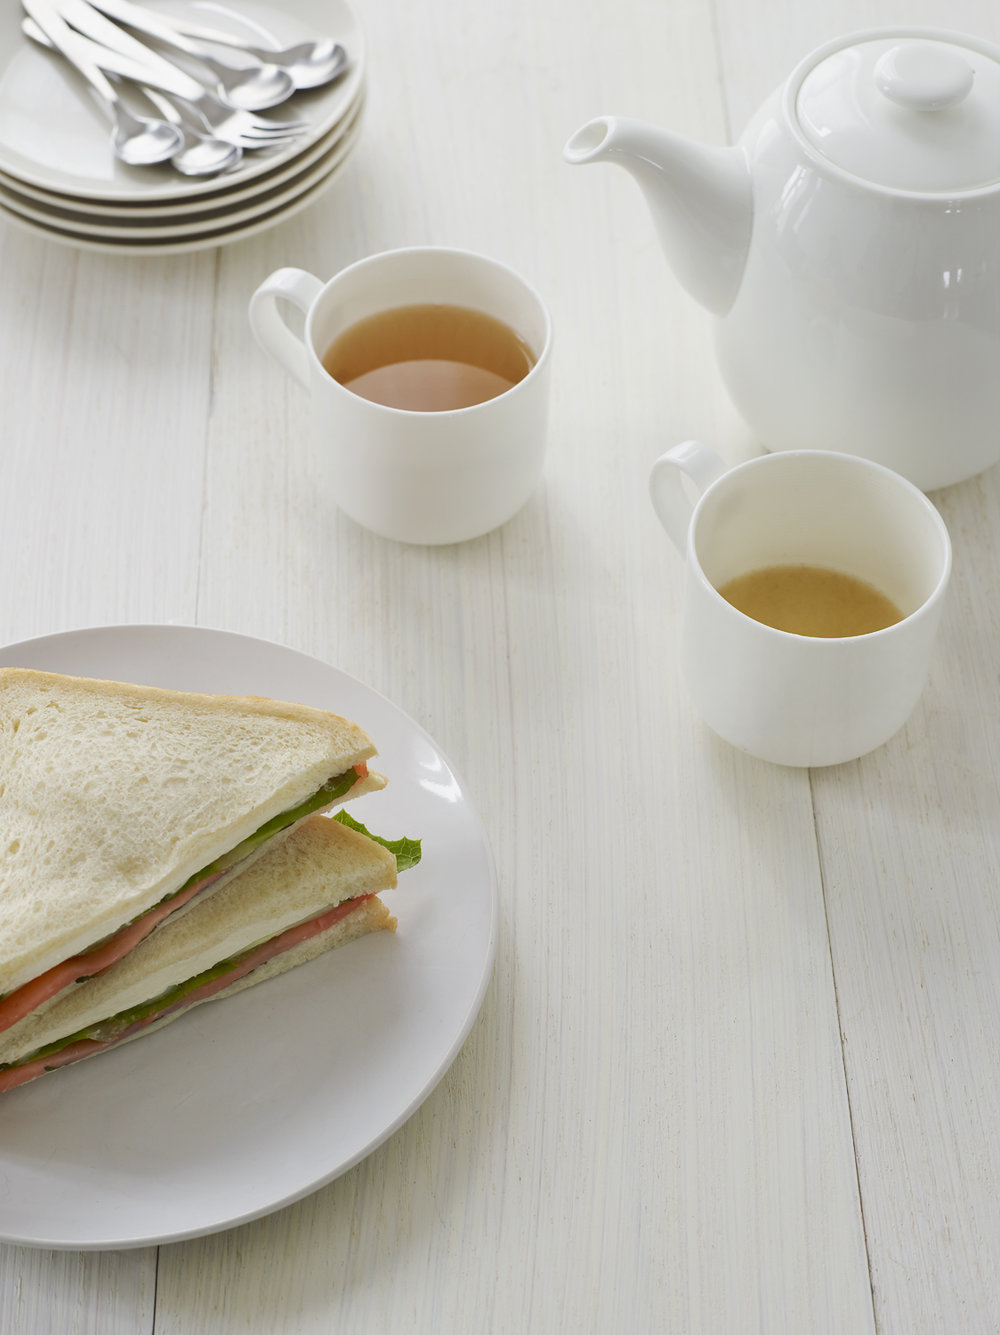 Sandwich042.jpg